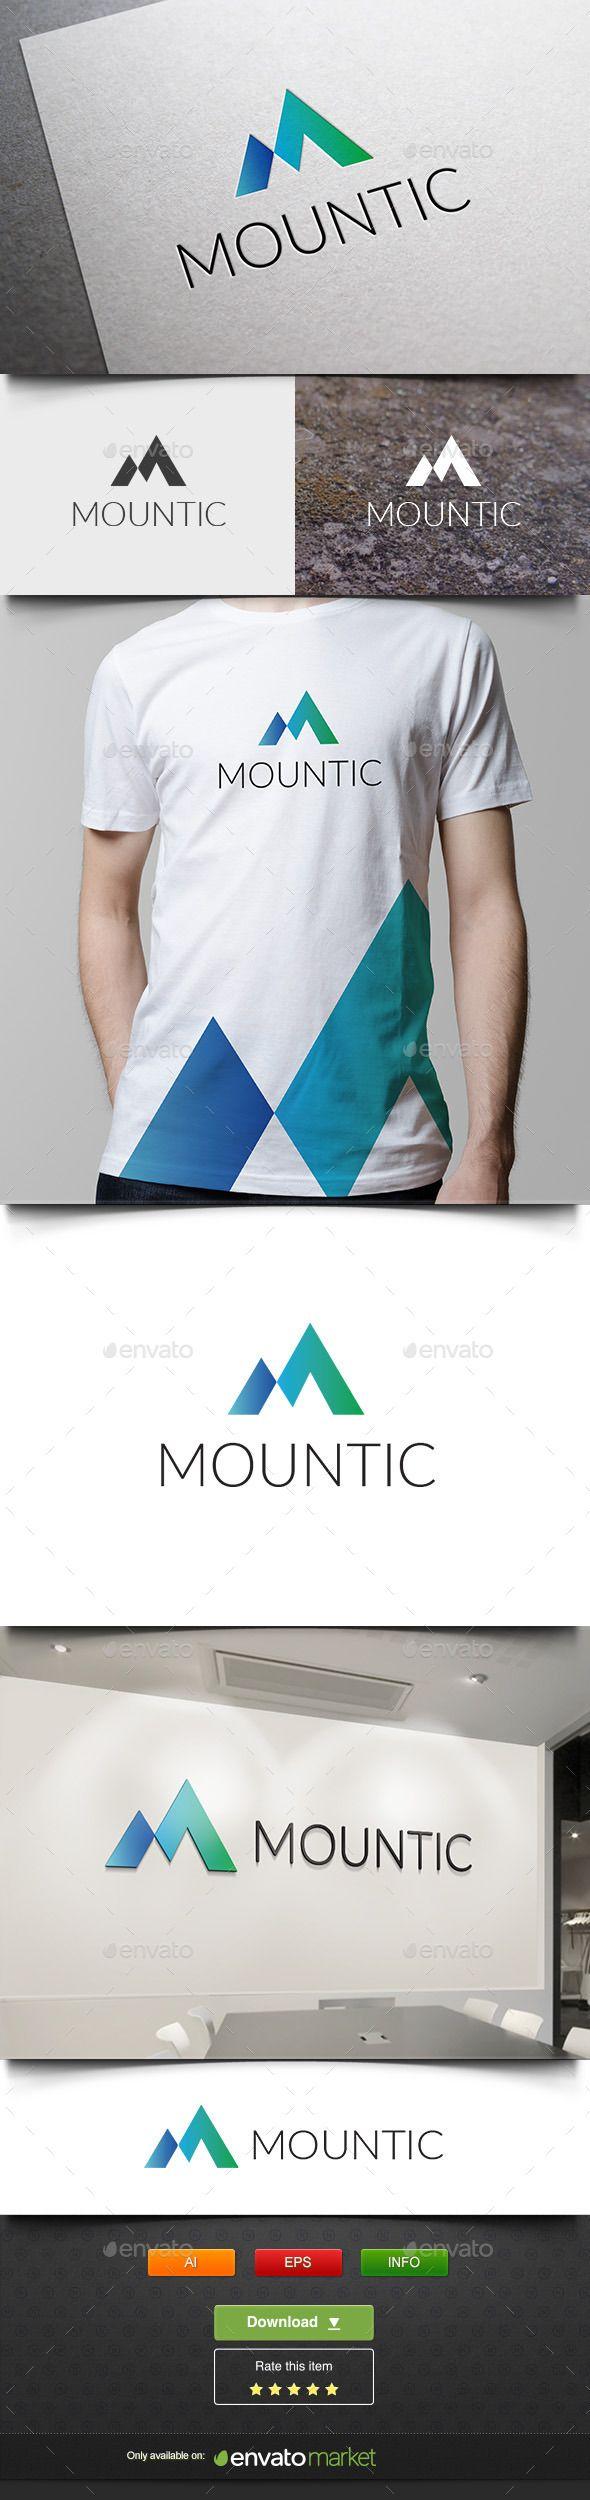 Mount Ice - Logo Design Template Vector #logotype Download it here: http://graphicriver.net/item/mount-ice/11825768?s_rank=1072?ref=nexion